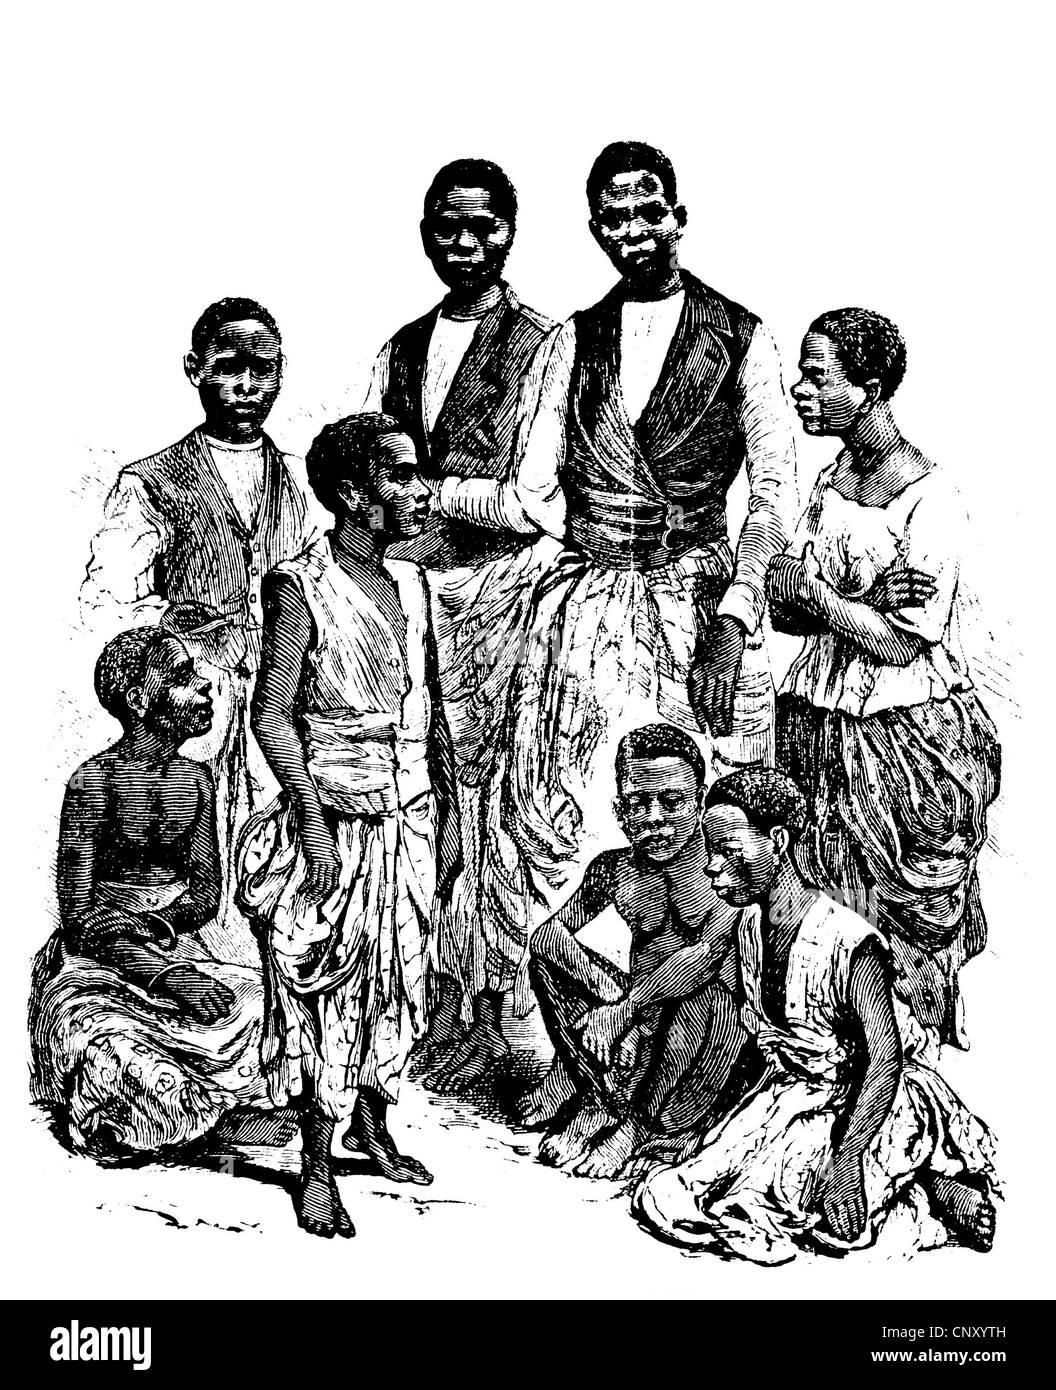 Inhabitants of the Congo, historical woodcut, circa 1888 - Stock Image